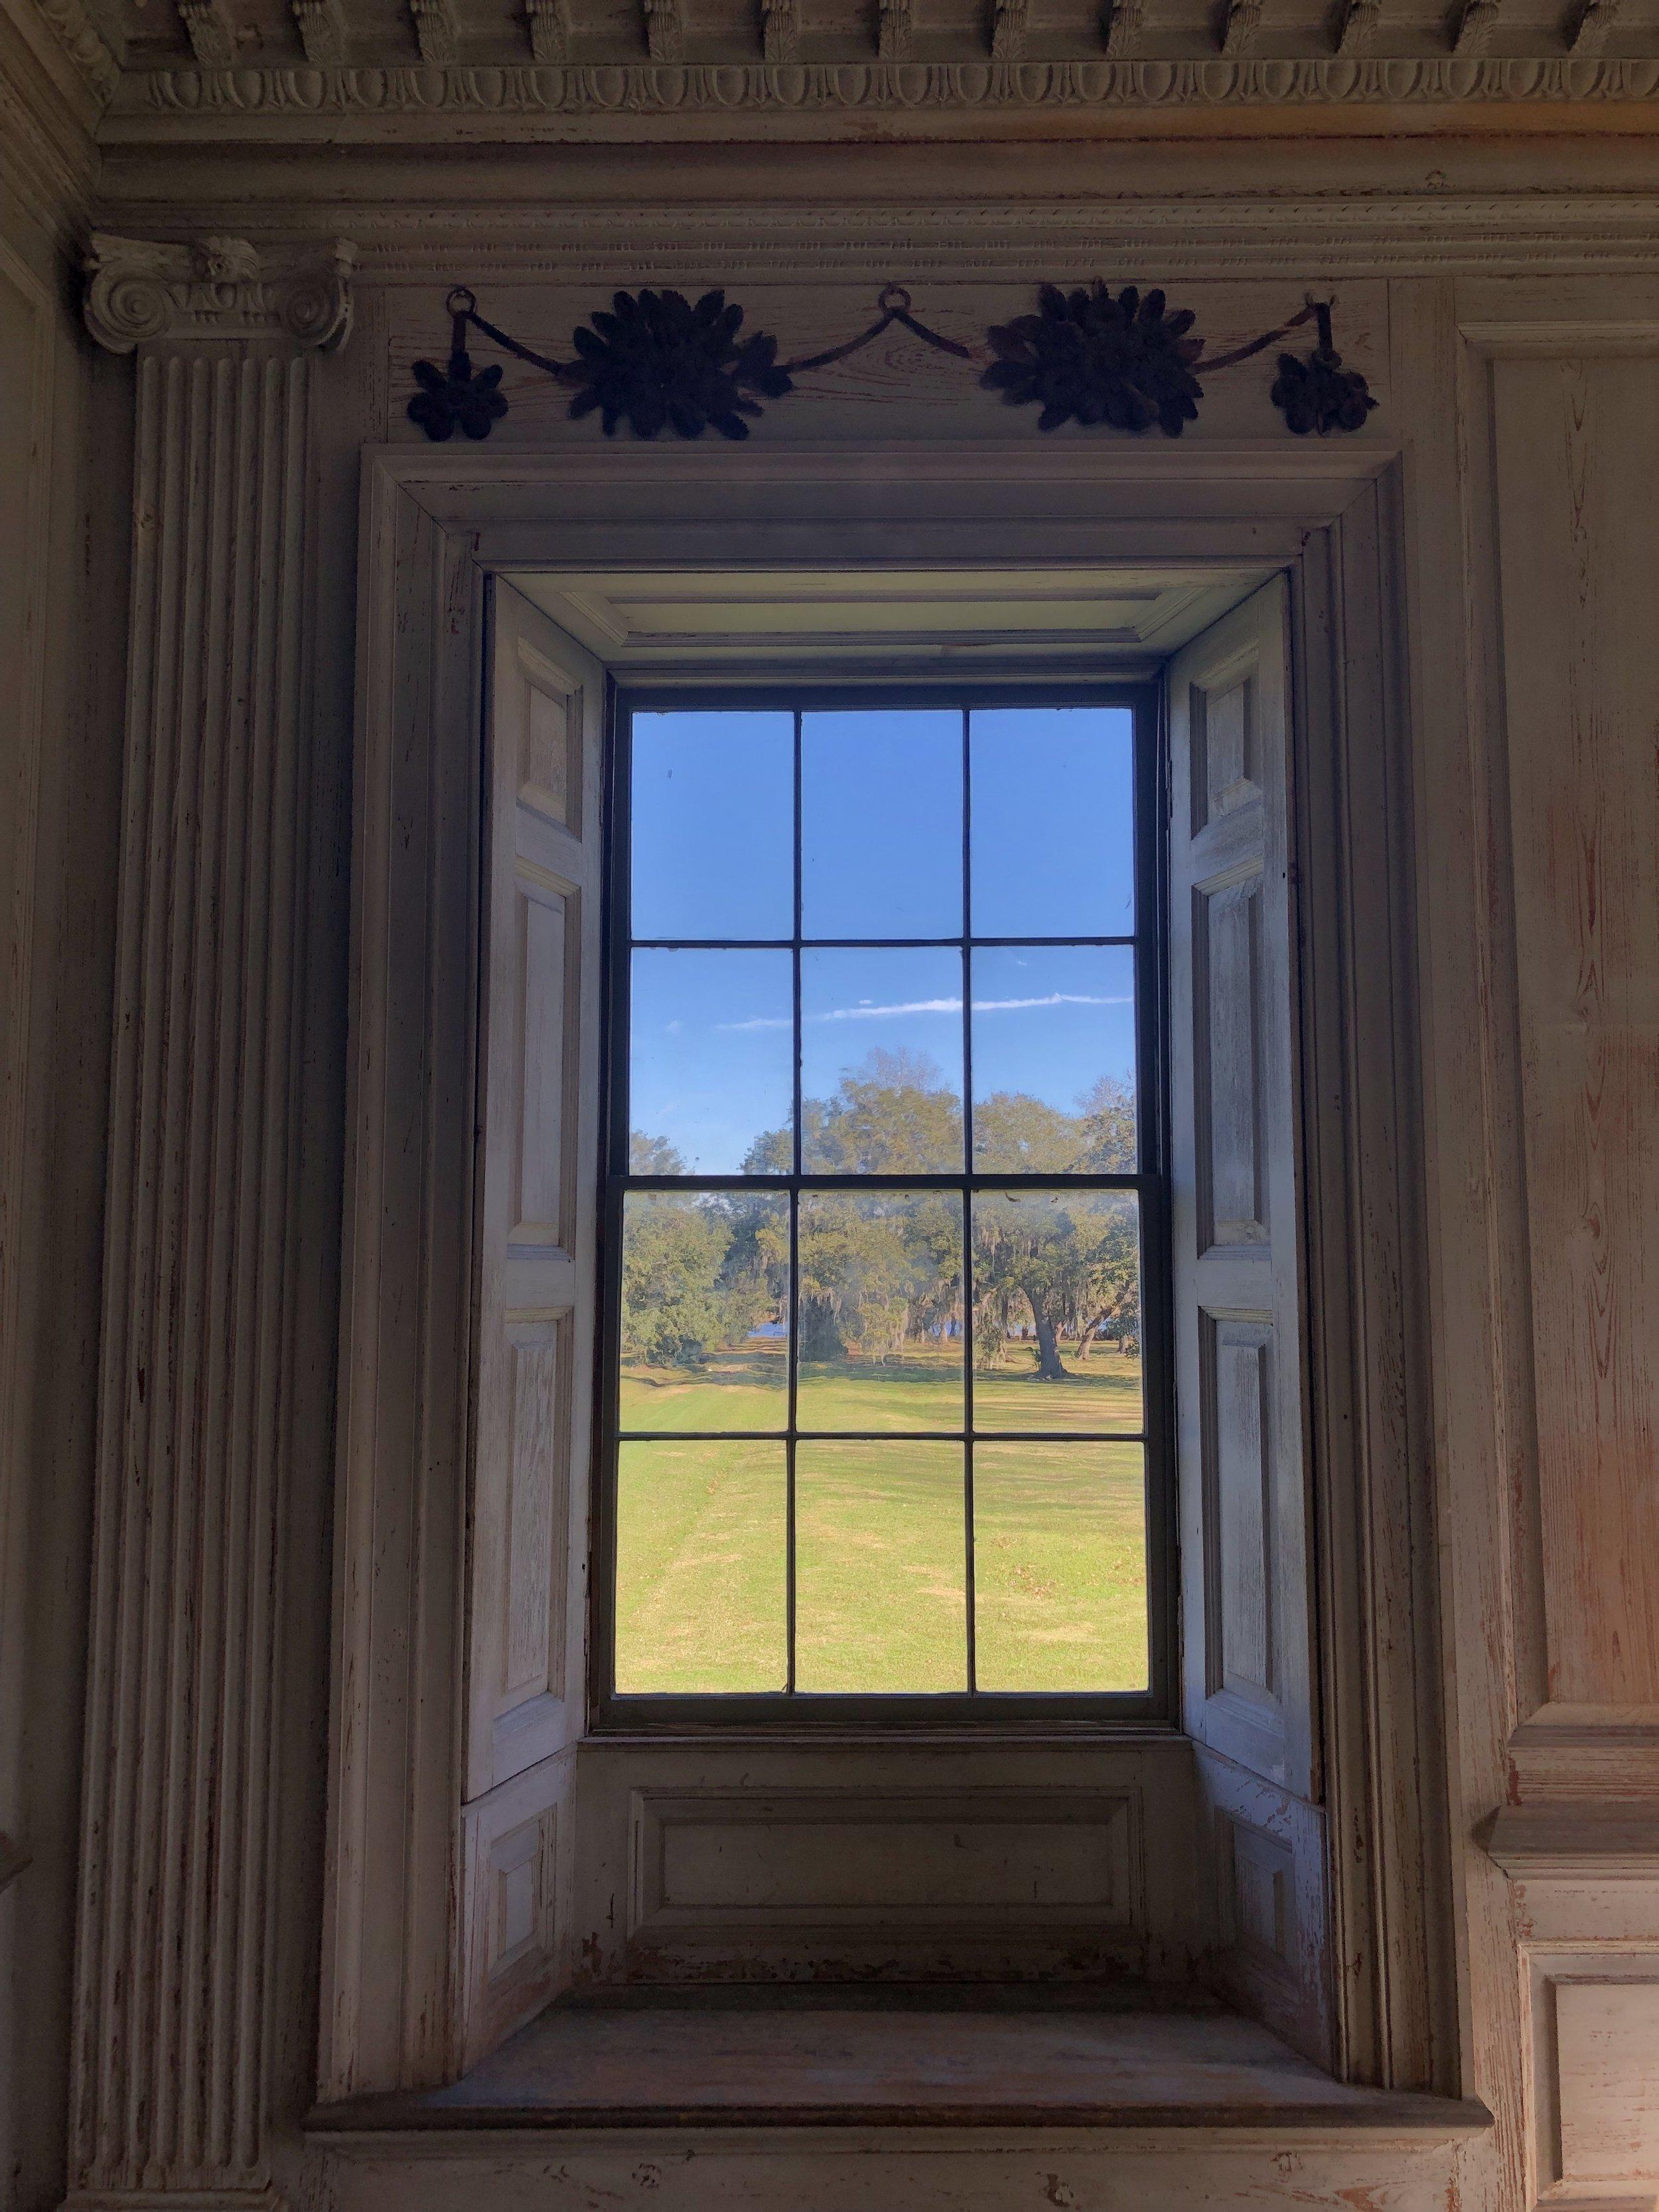 wanderlust-travel-blog-drayton-hall-charleston-manor-window-view